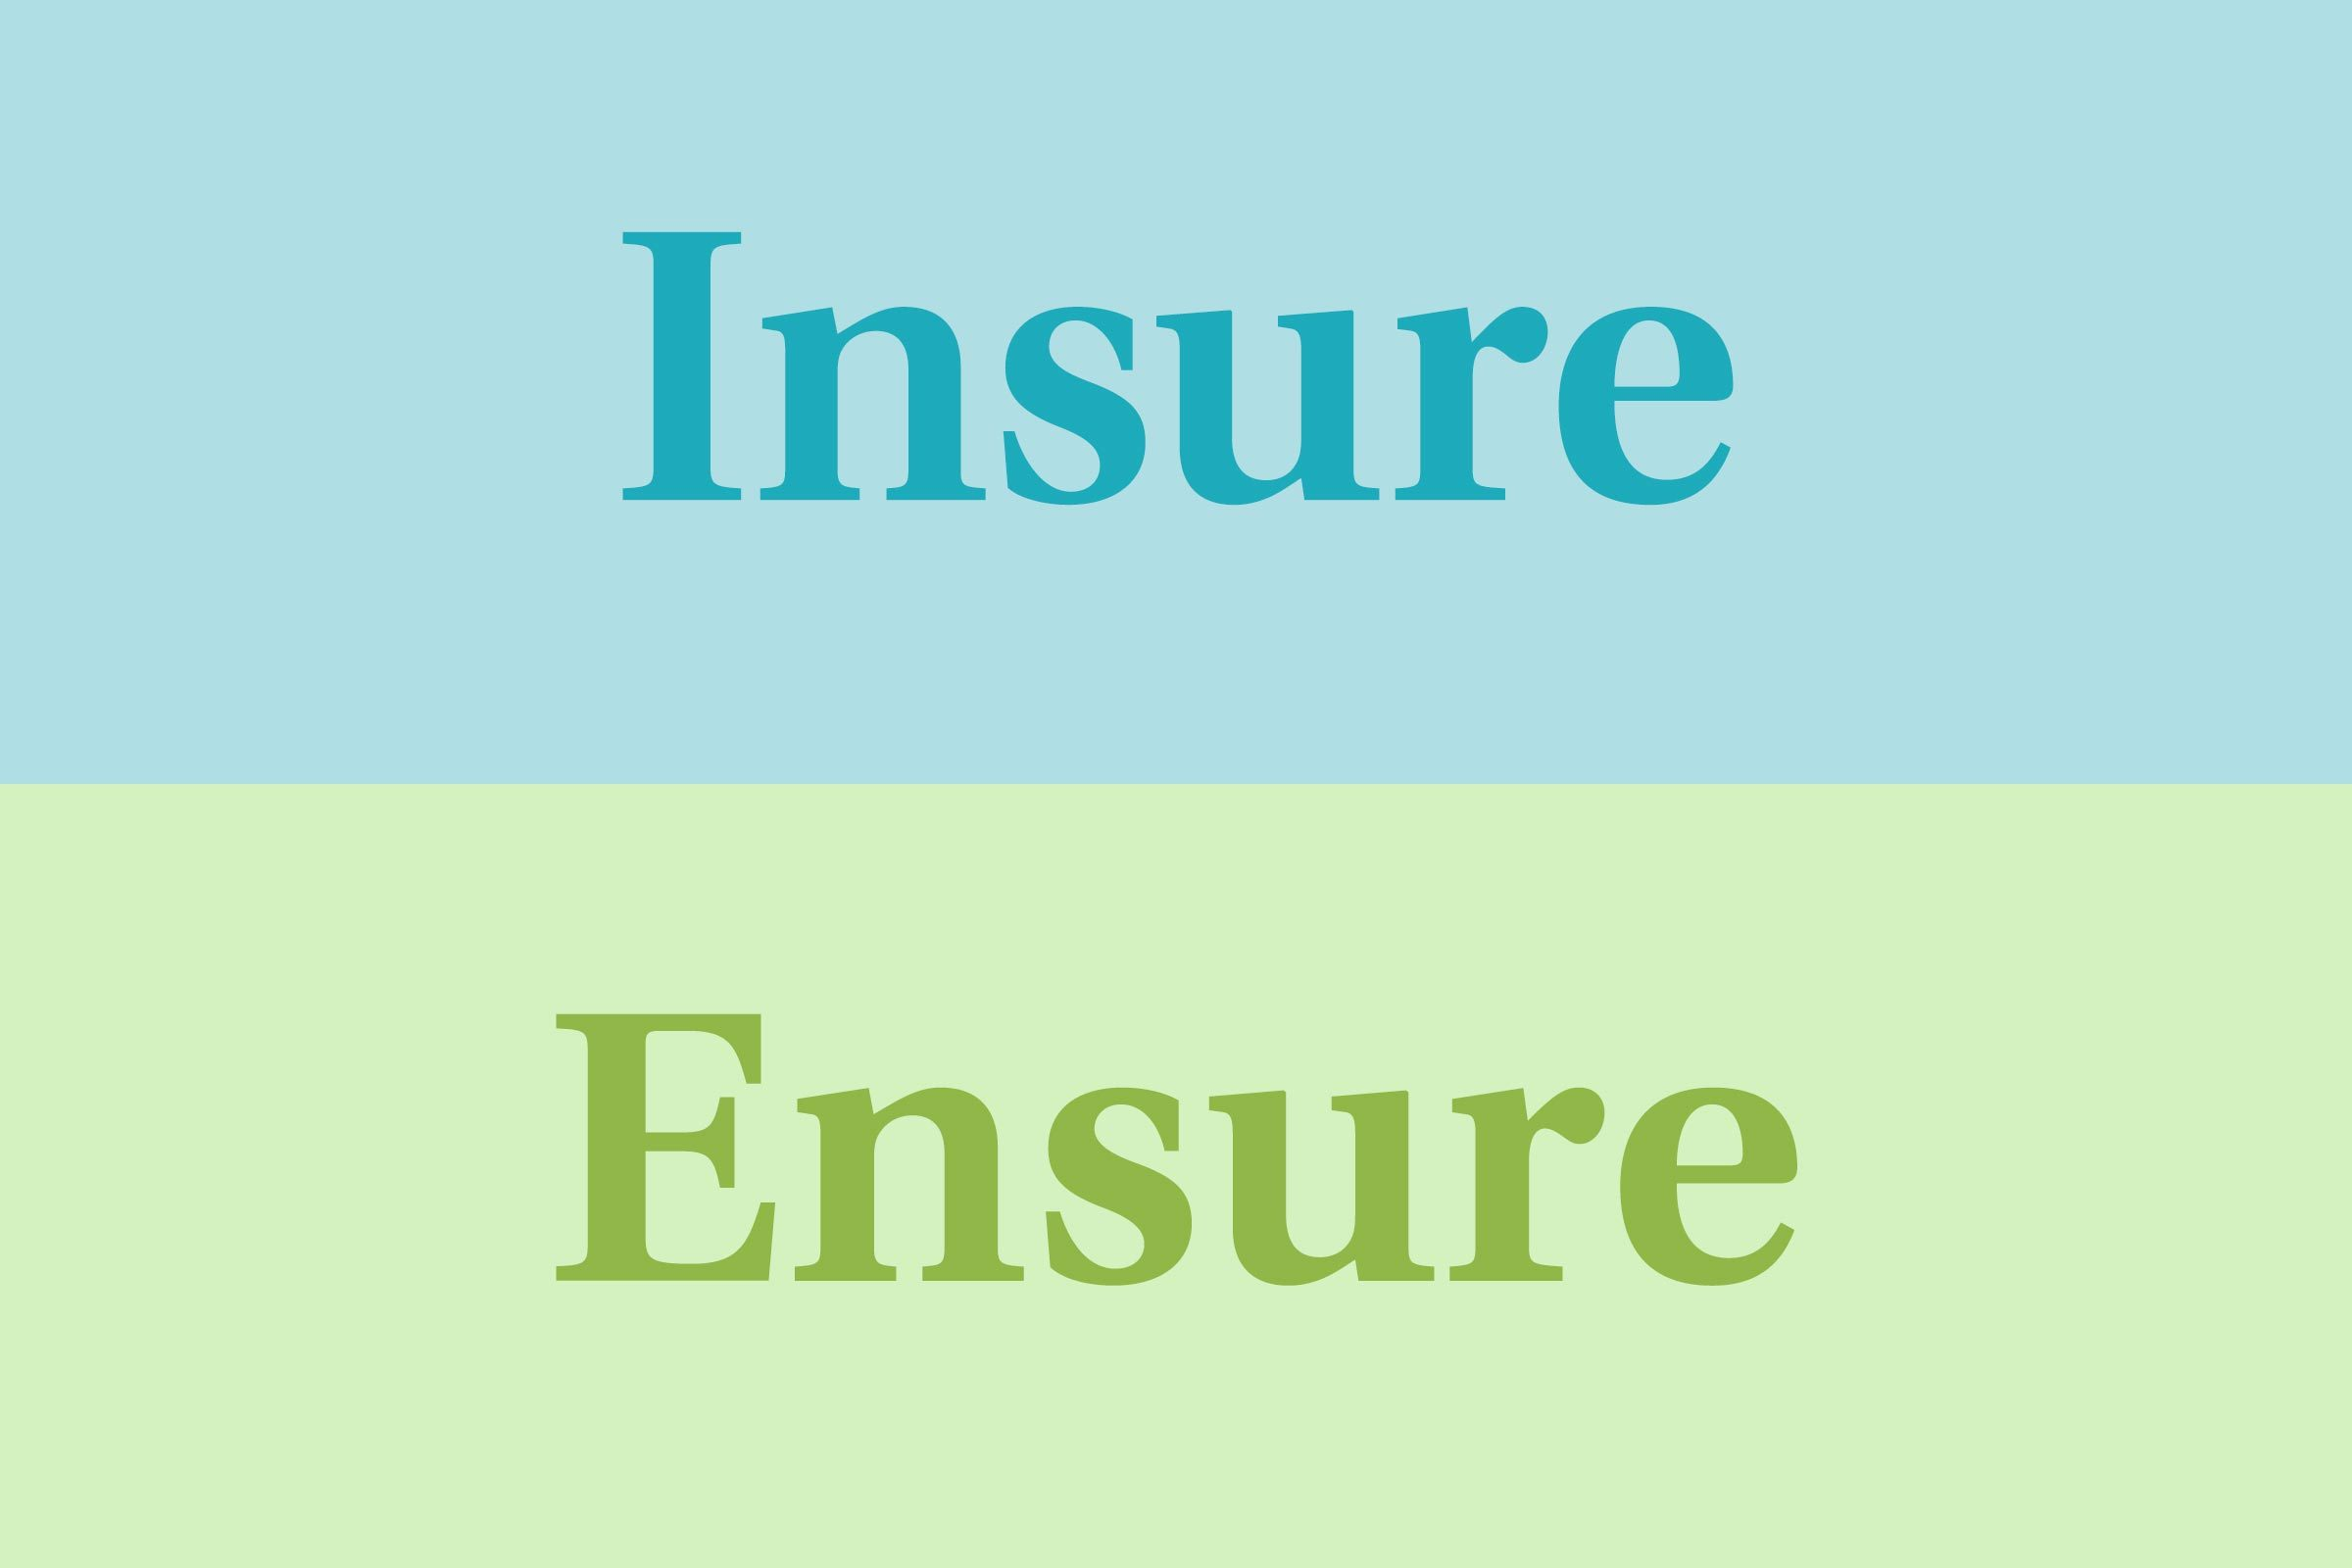 Insure vs. ensure